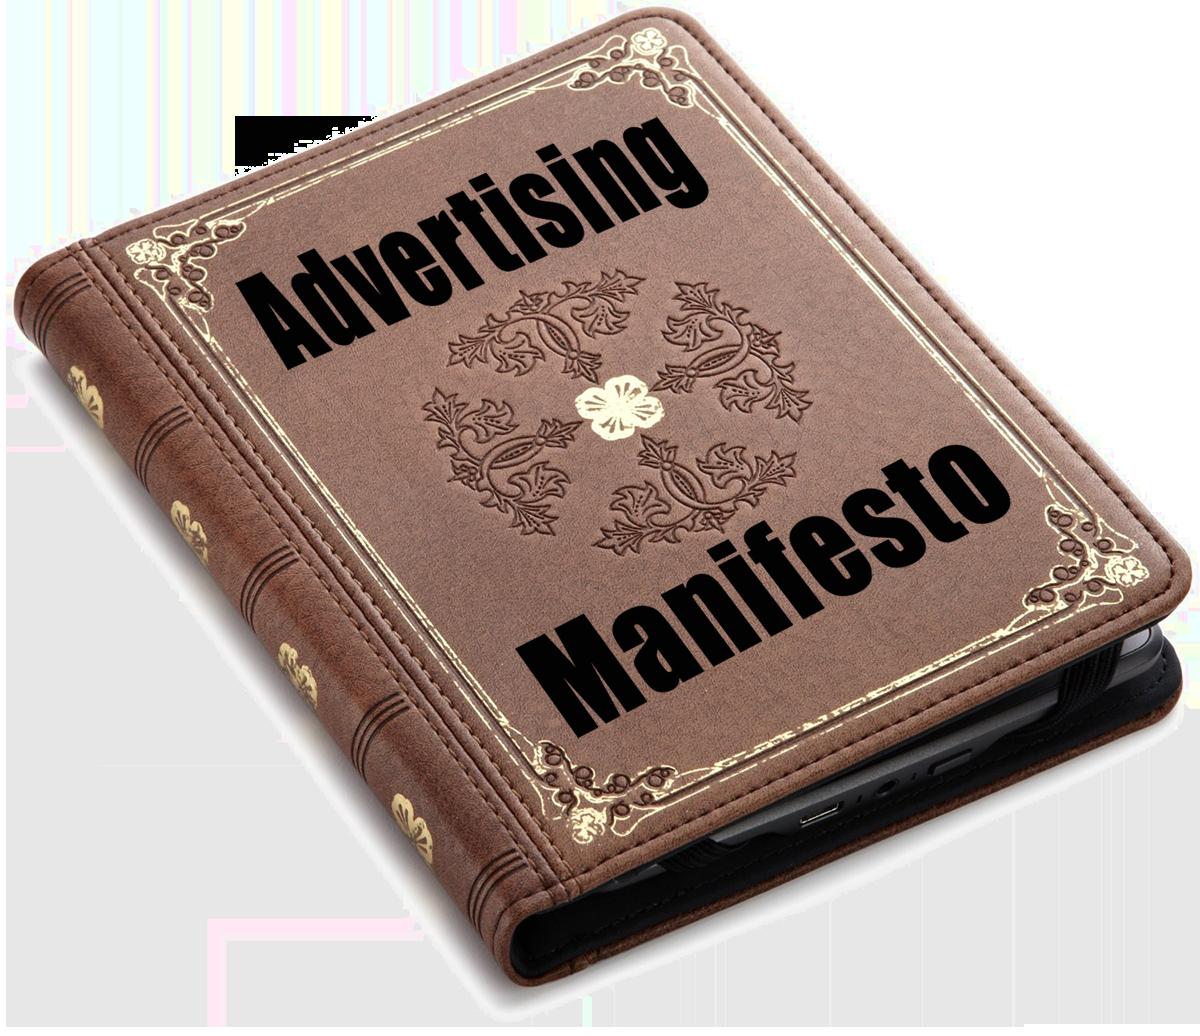 Advertising Manifesto